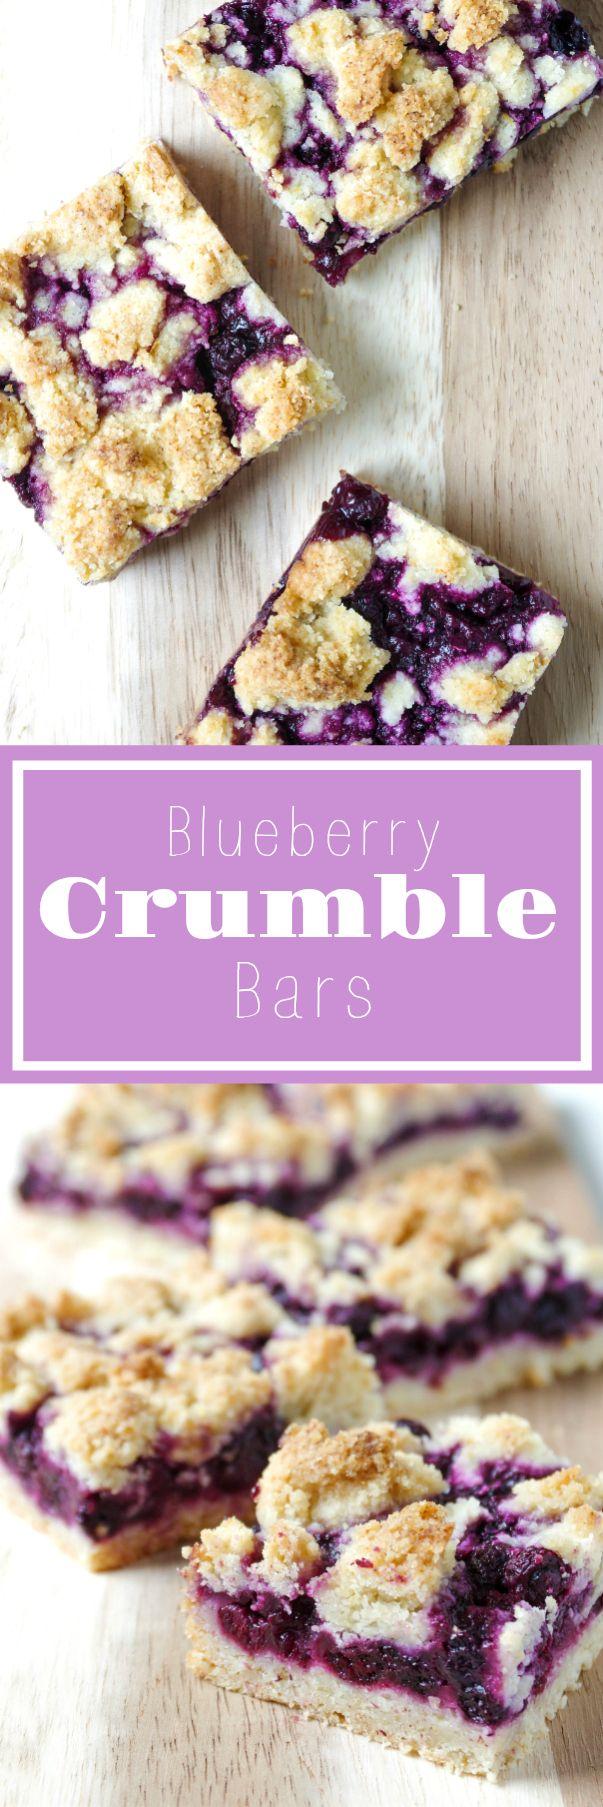 Blueberry Crumble Bars via @theforkedspoon #blueberry #dessert #easyrecipe #bars #sweet #theforkedspoon via @theforkedspoon